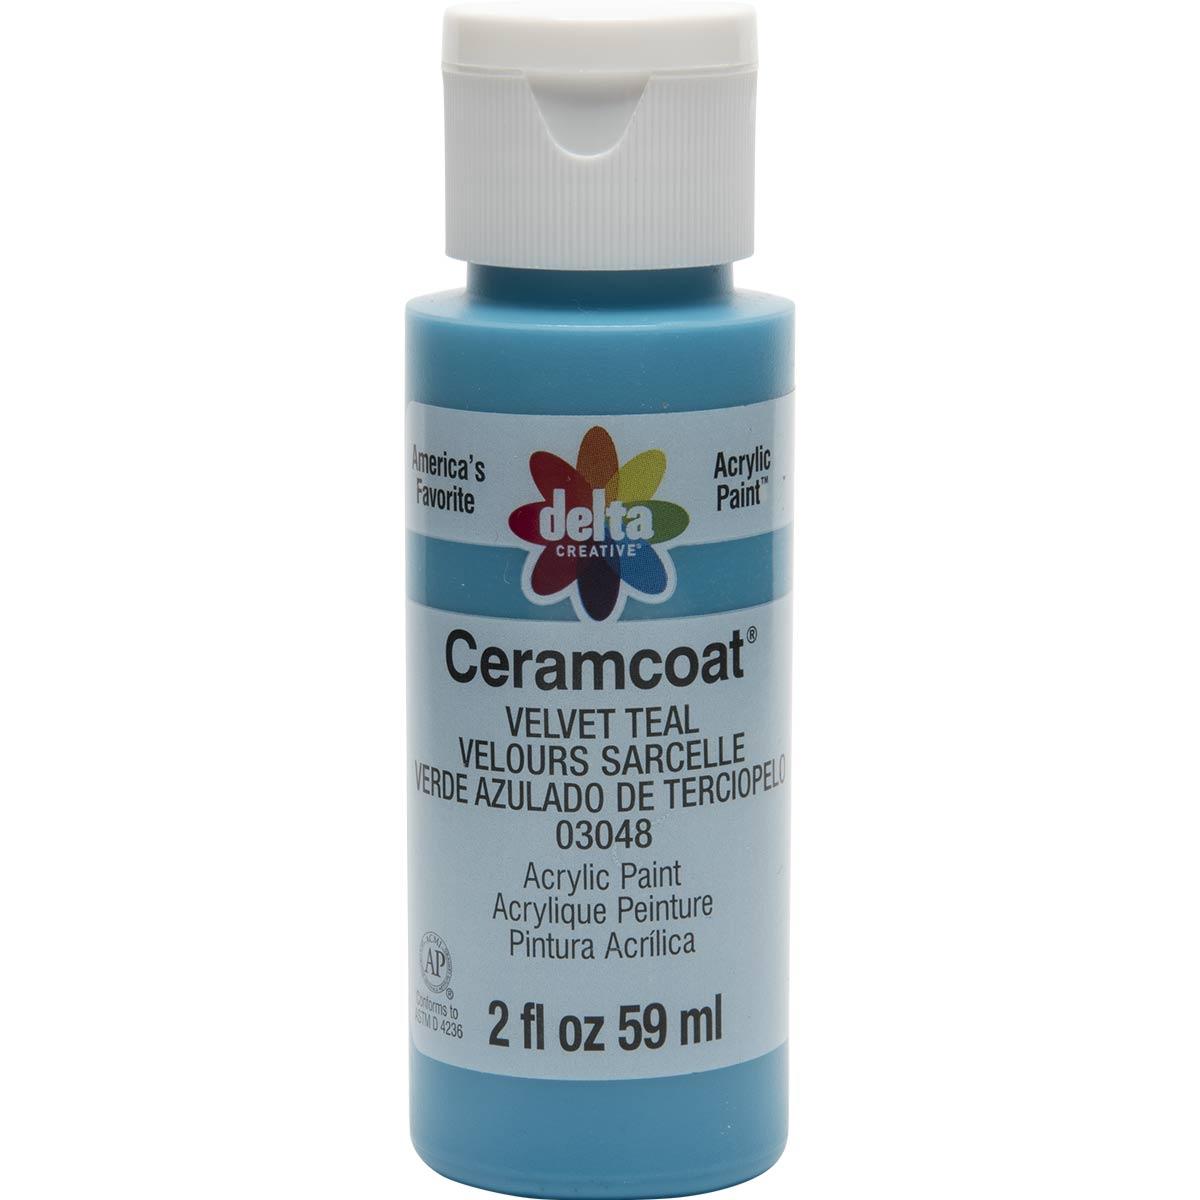 Delta Ceramcoat ® Acrylic Paint - Velvet Teal, 2 oz.